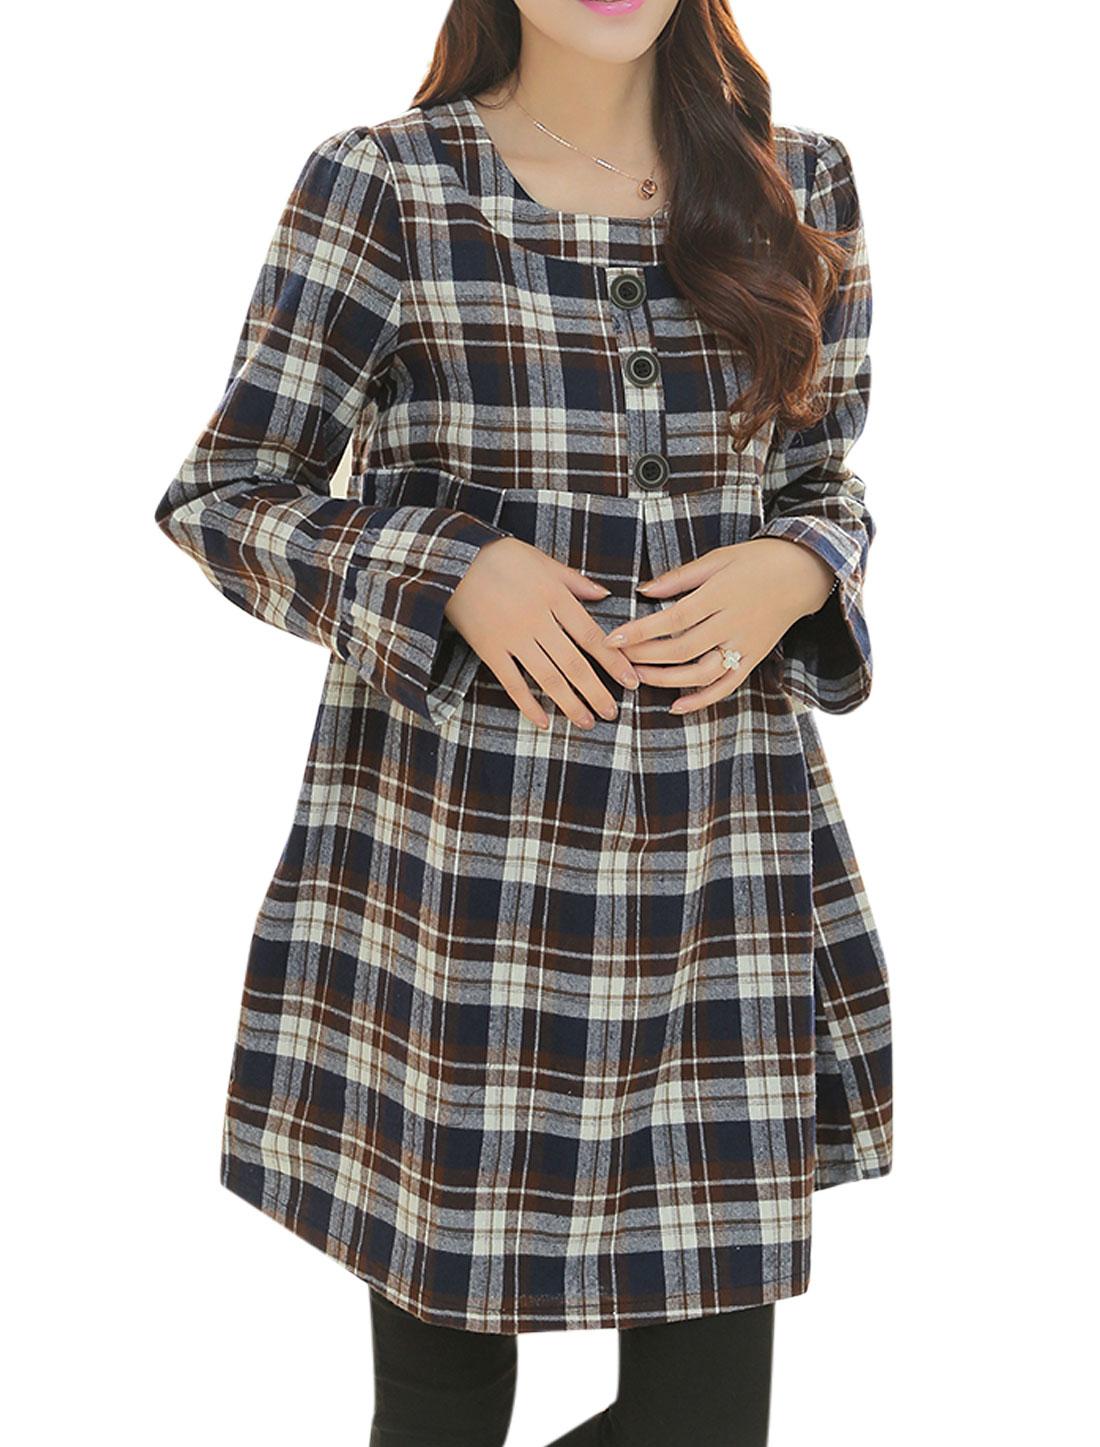 Pregnant Women Checks Pattern Long Sleeve Short Dress Navy Blue Brown M